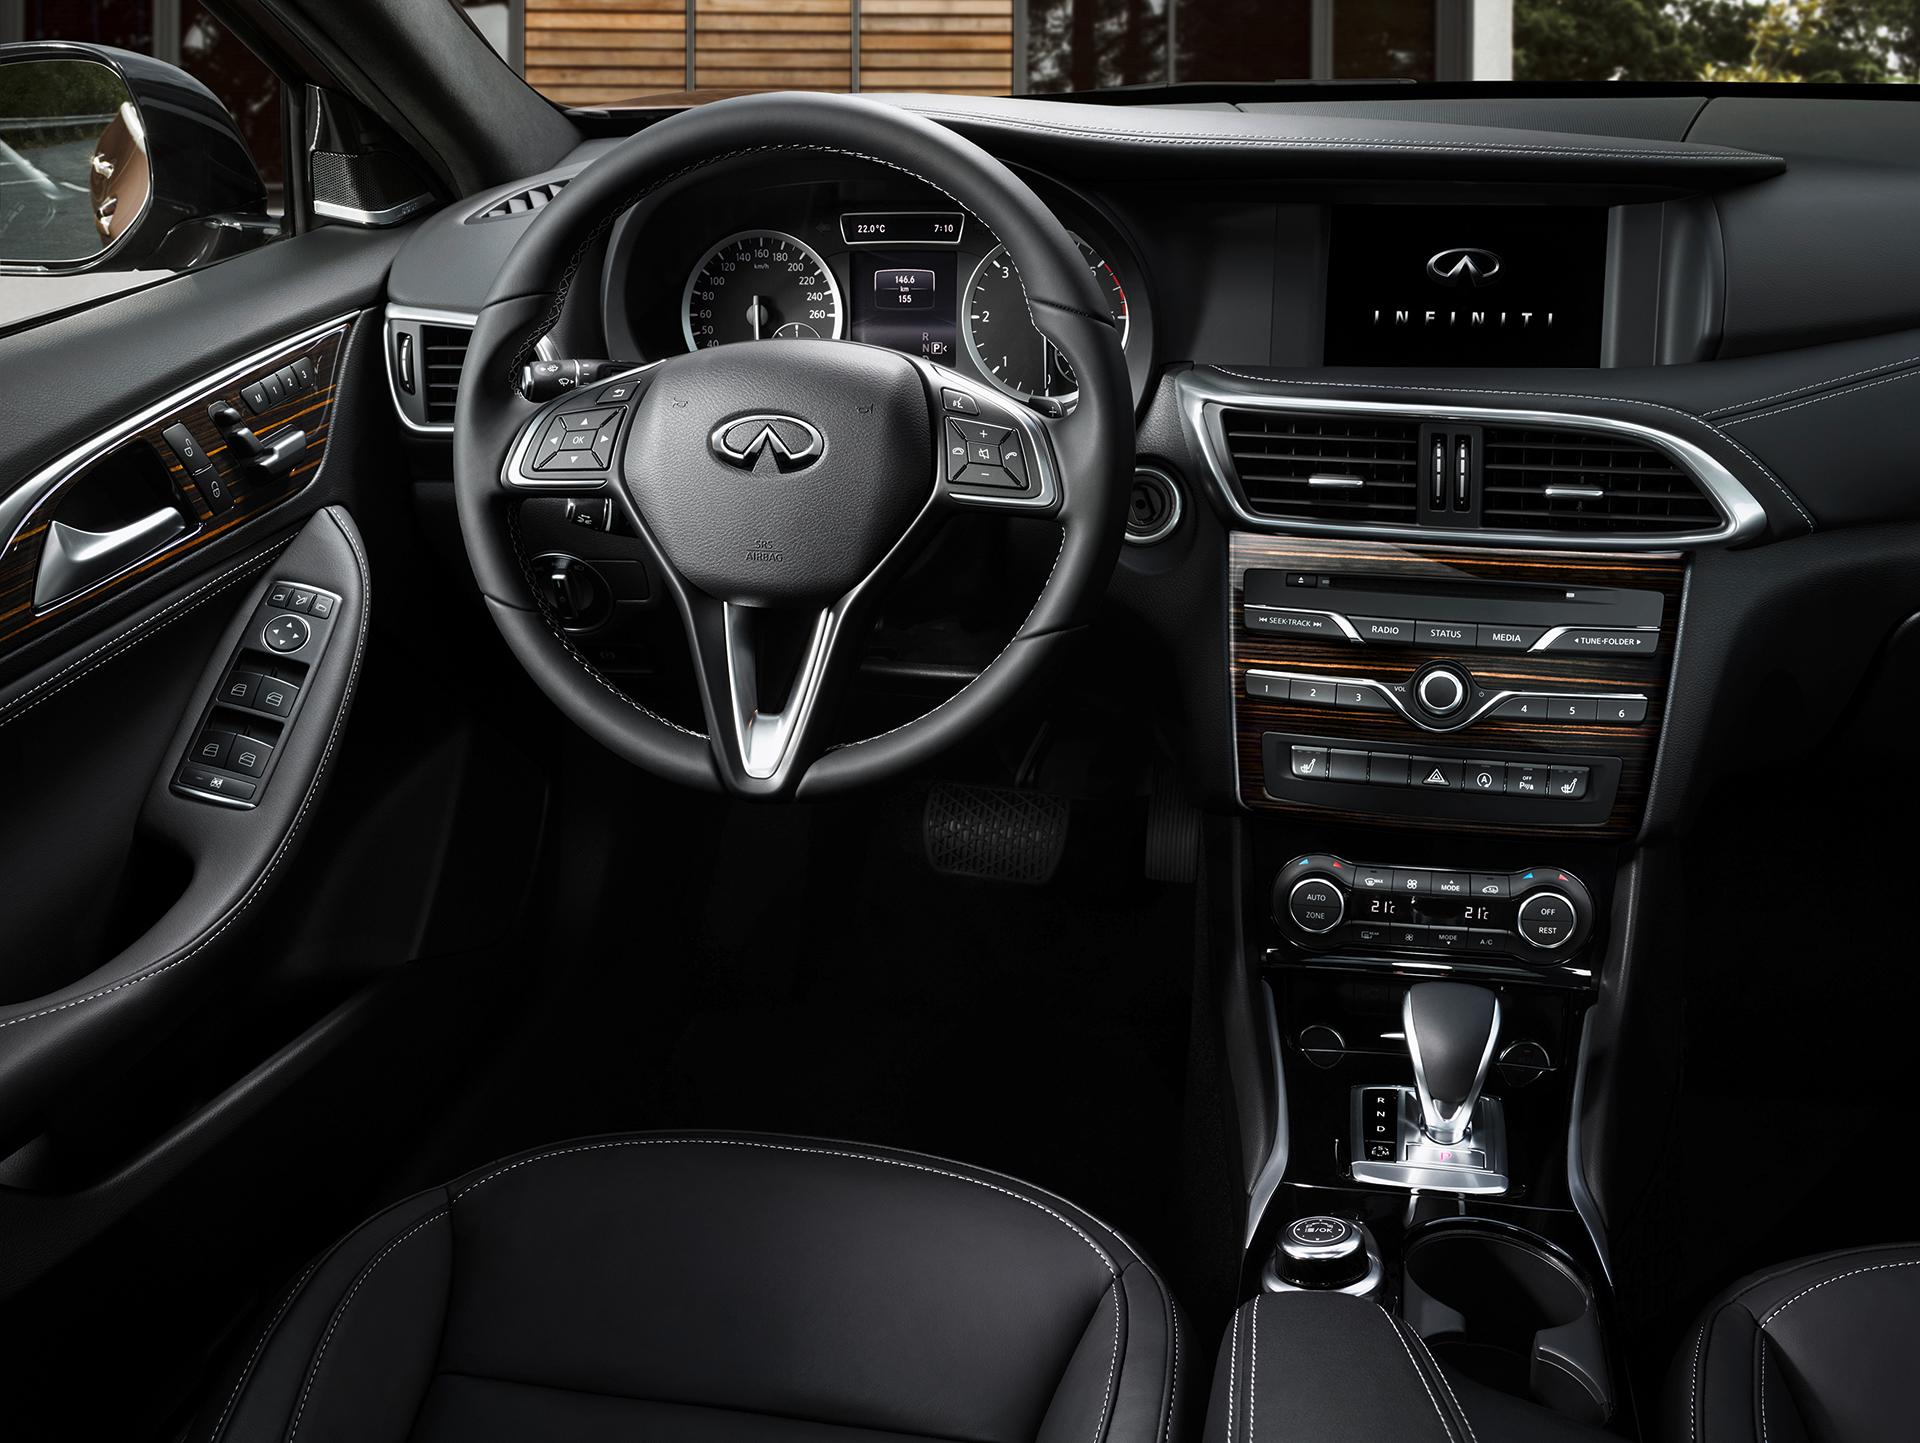 Infiniti Q30 - 2016 - interior / intérieur